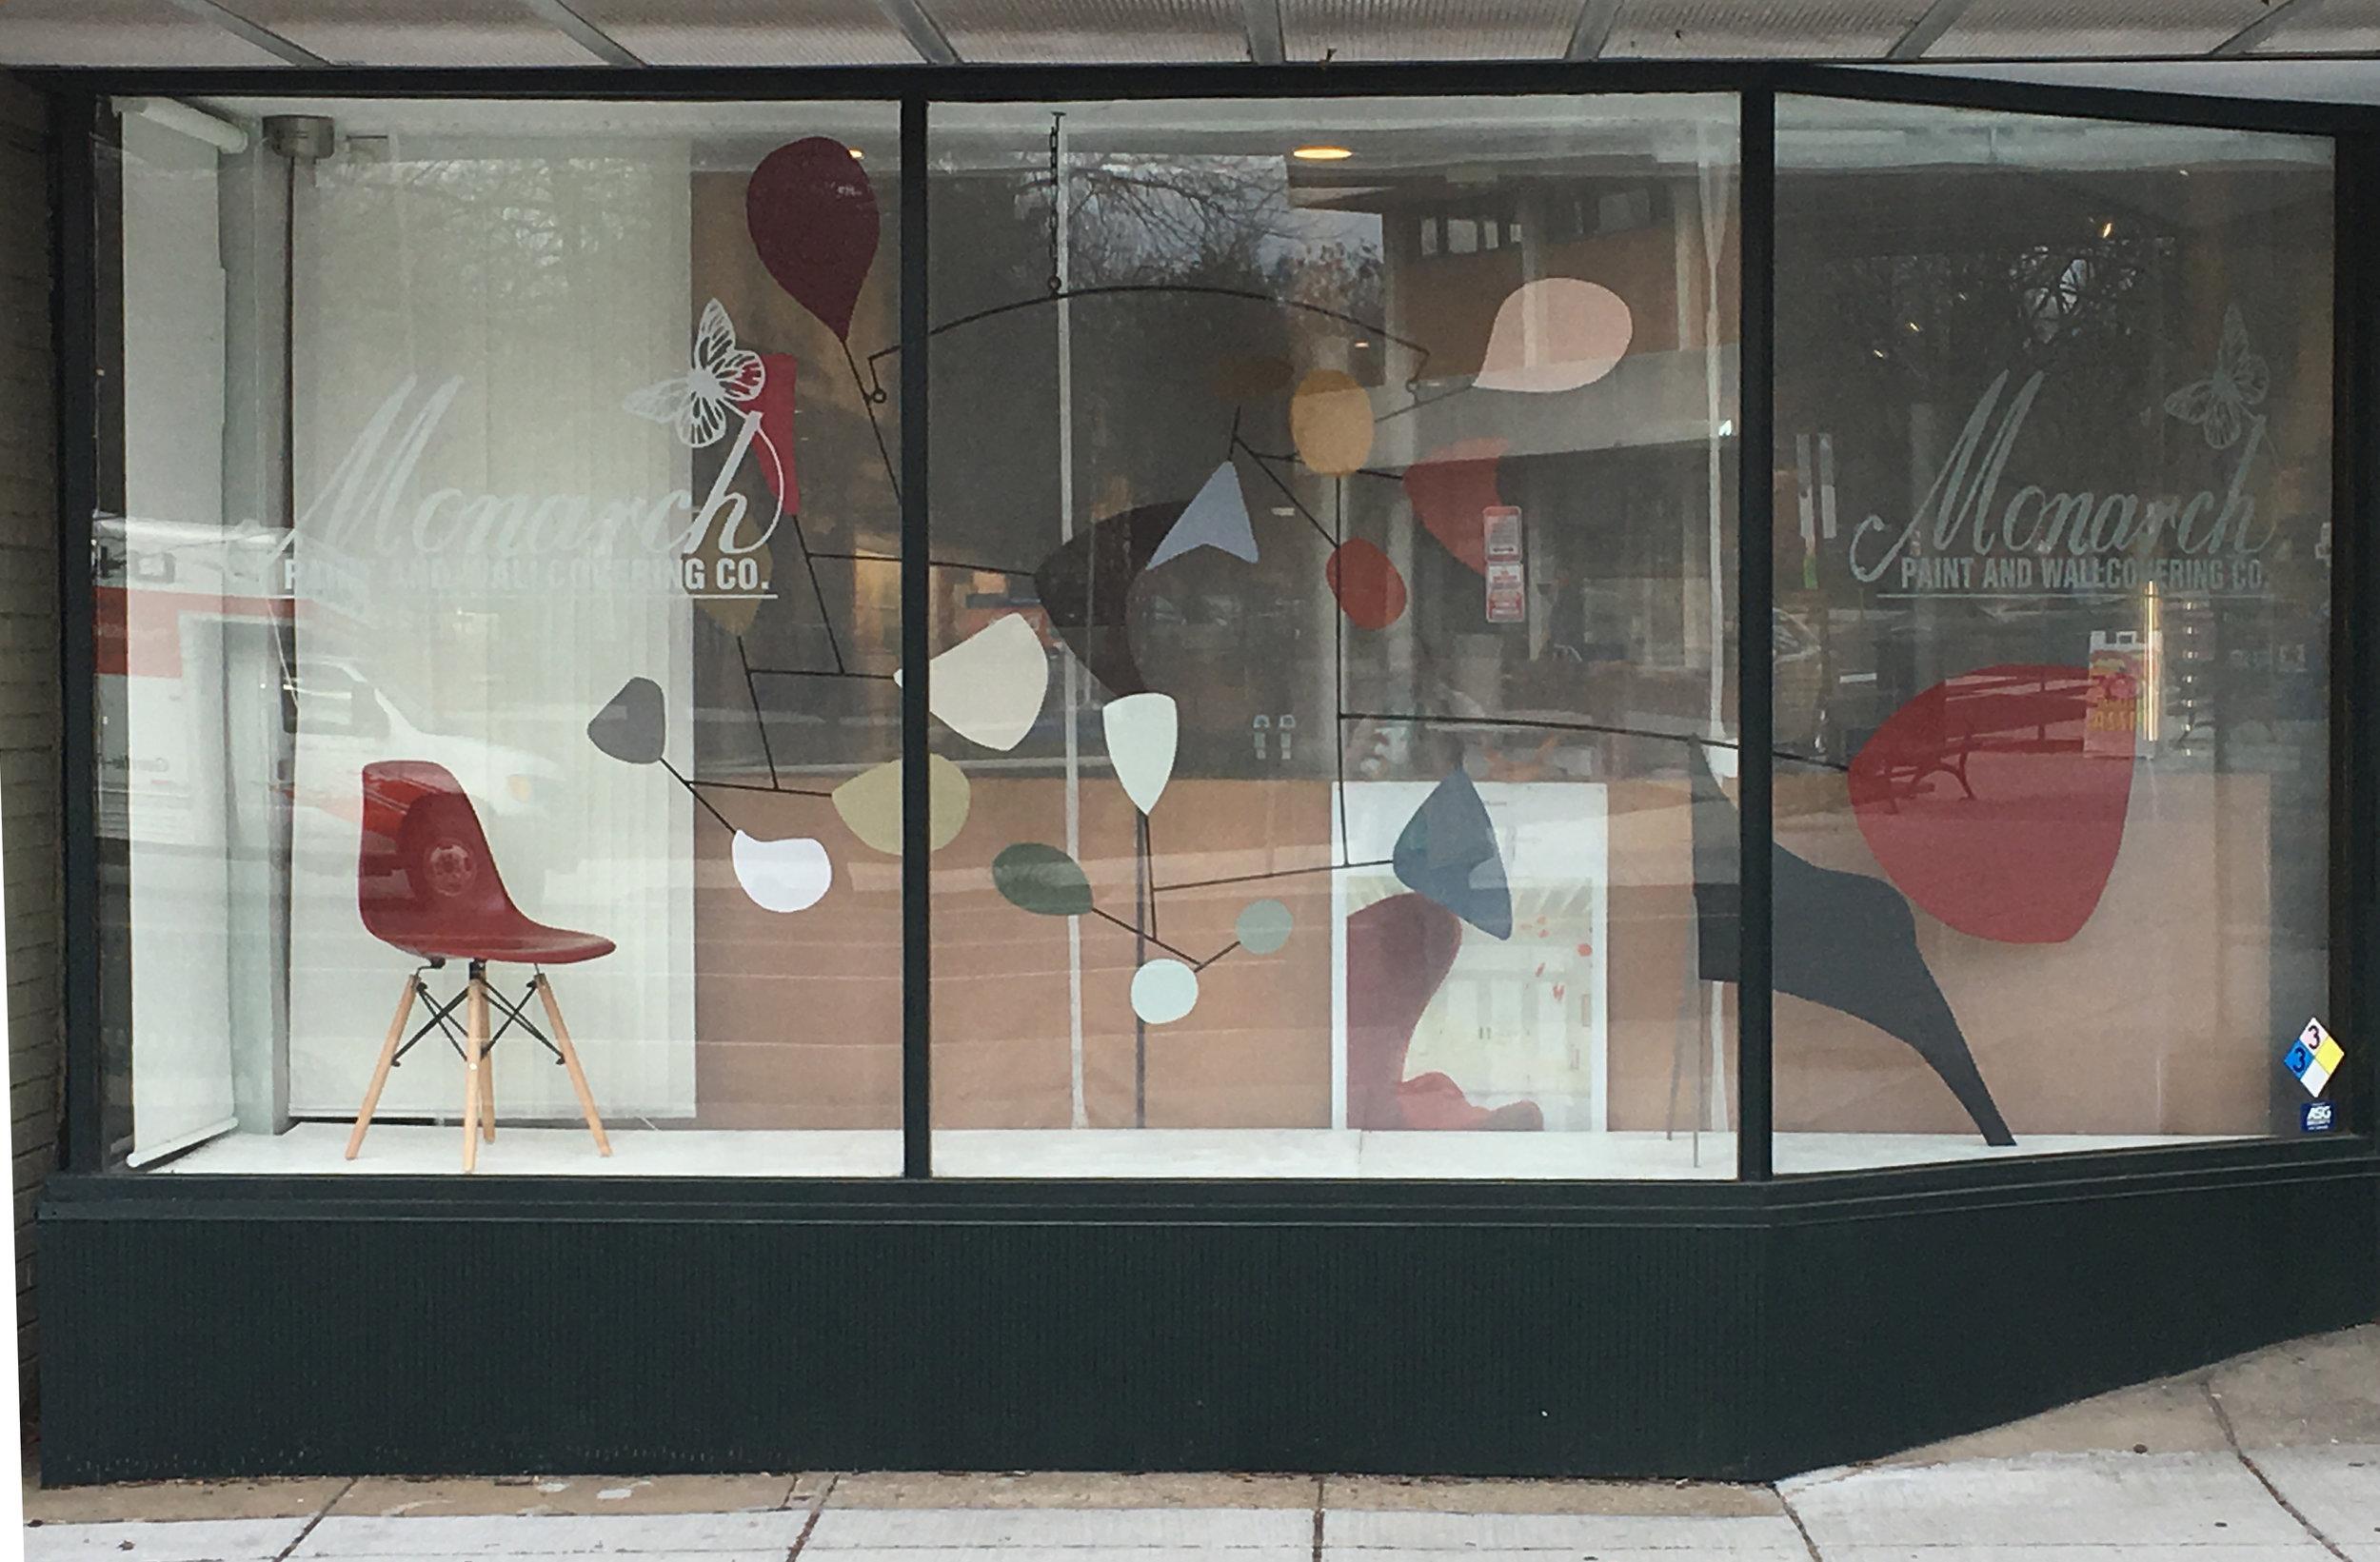 "Calderesque Conversations (Benjamin Moore 2018 Color Trends)  91"" x 83"" x 35""  steel, latex paint  2018  @ Monarch Paint and Design Center, Washington, DC"